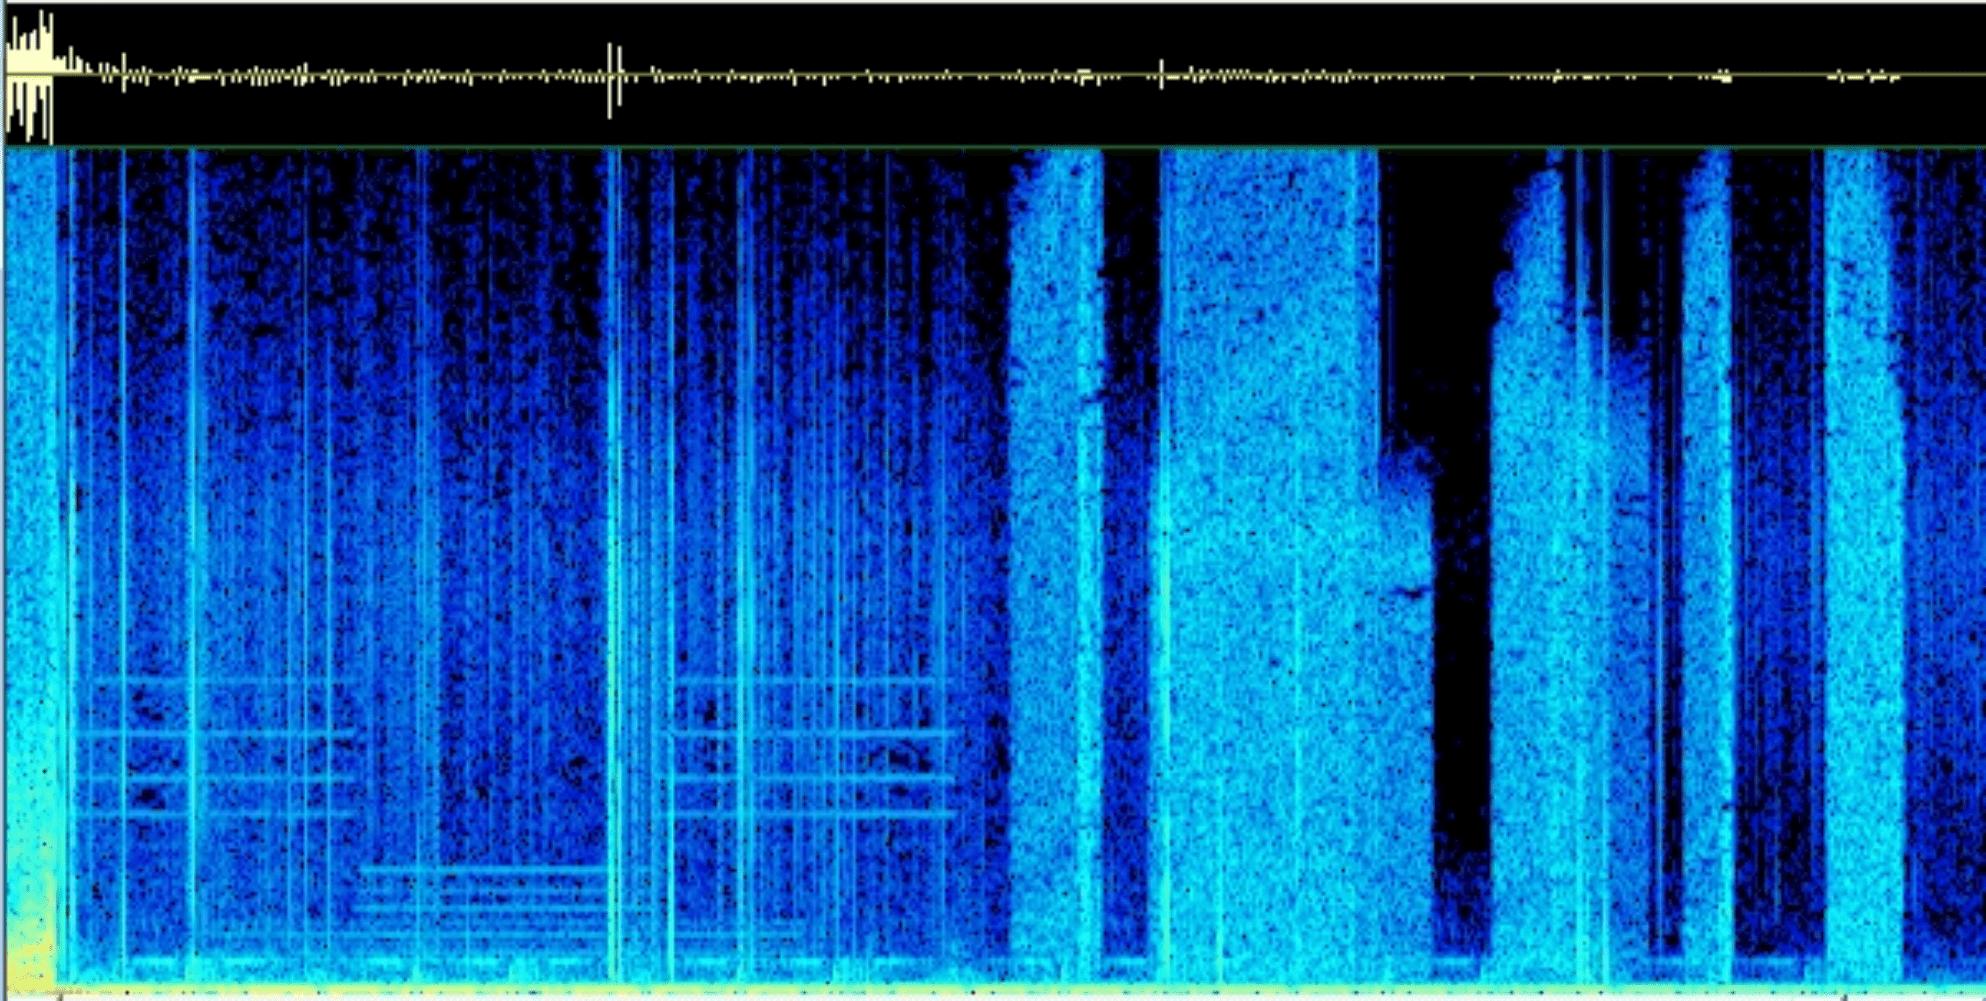 Minecraft Spectrogram